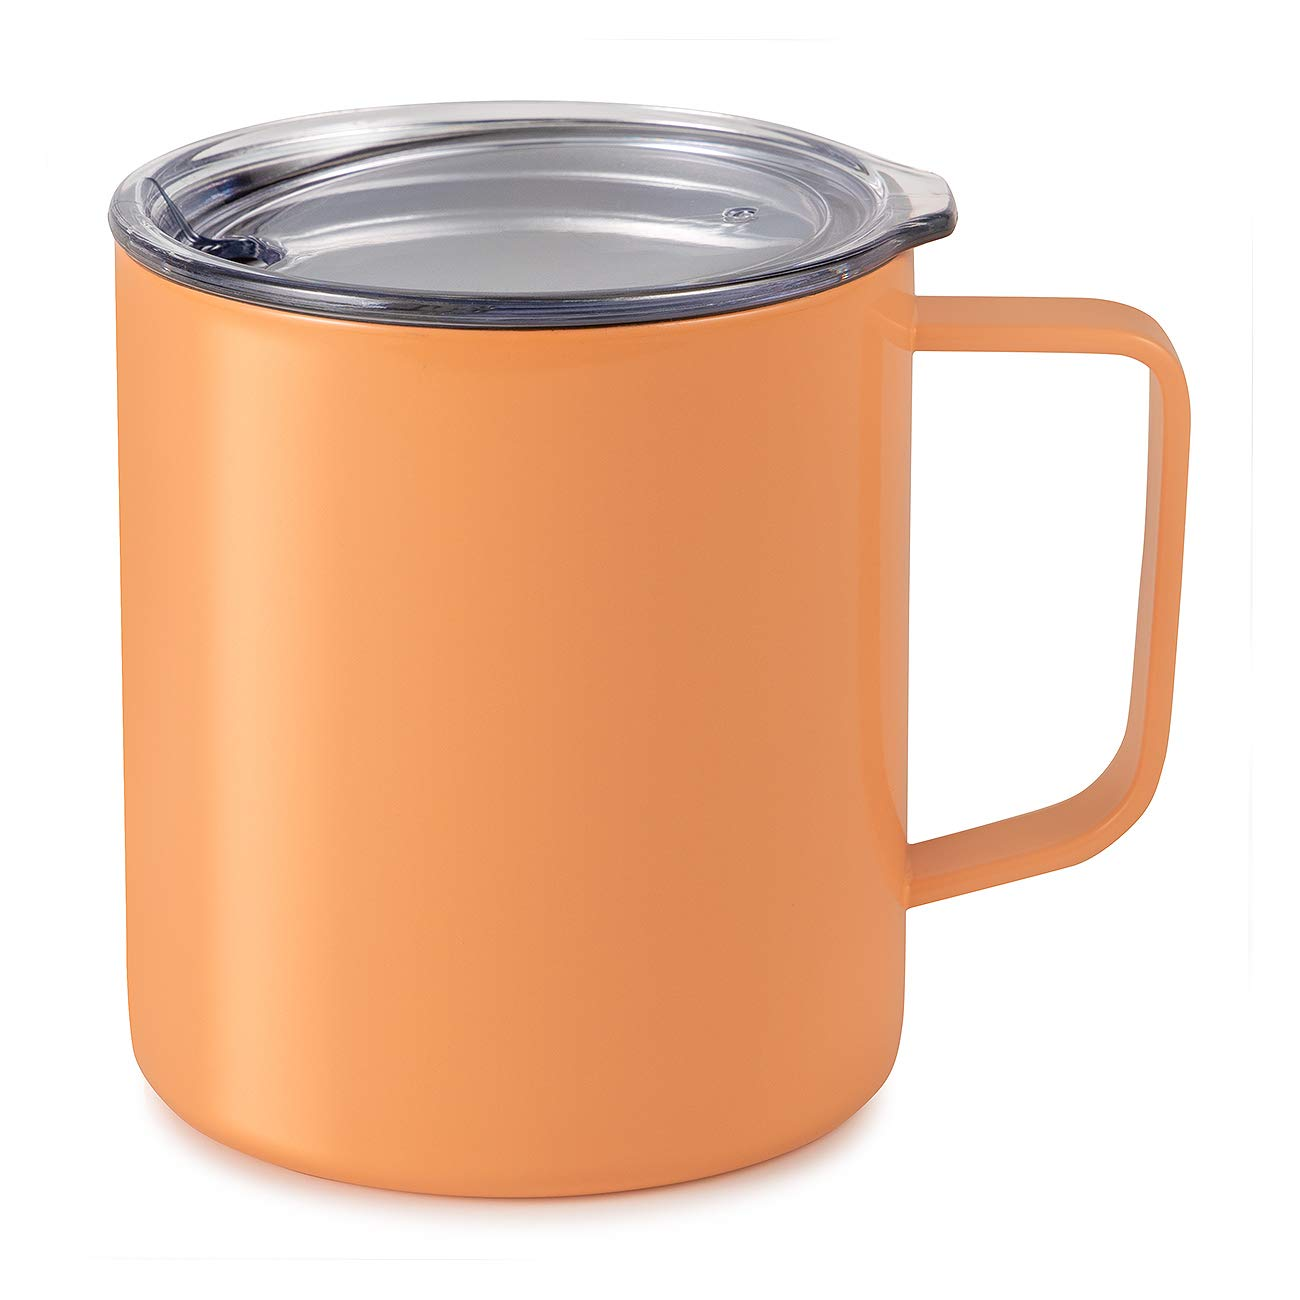 Maars Drinkware 79708-1PK Townie Stainless Steel Insulated Coffee Mug Double Wall Vacuum Sealed Tumbler-14 oz, 1 Pack, Peach